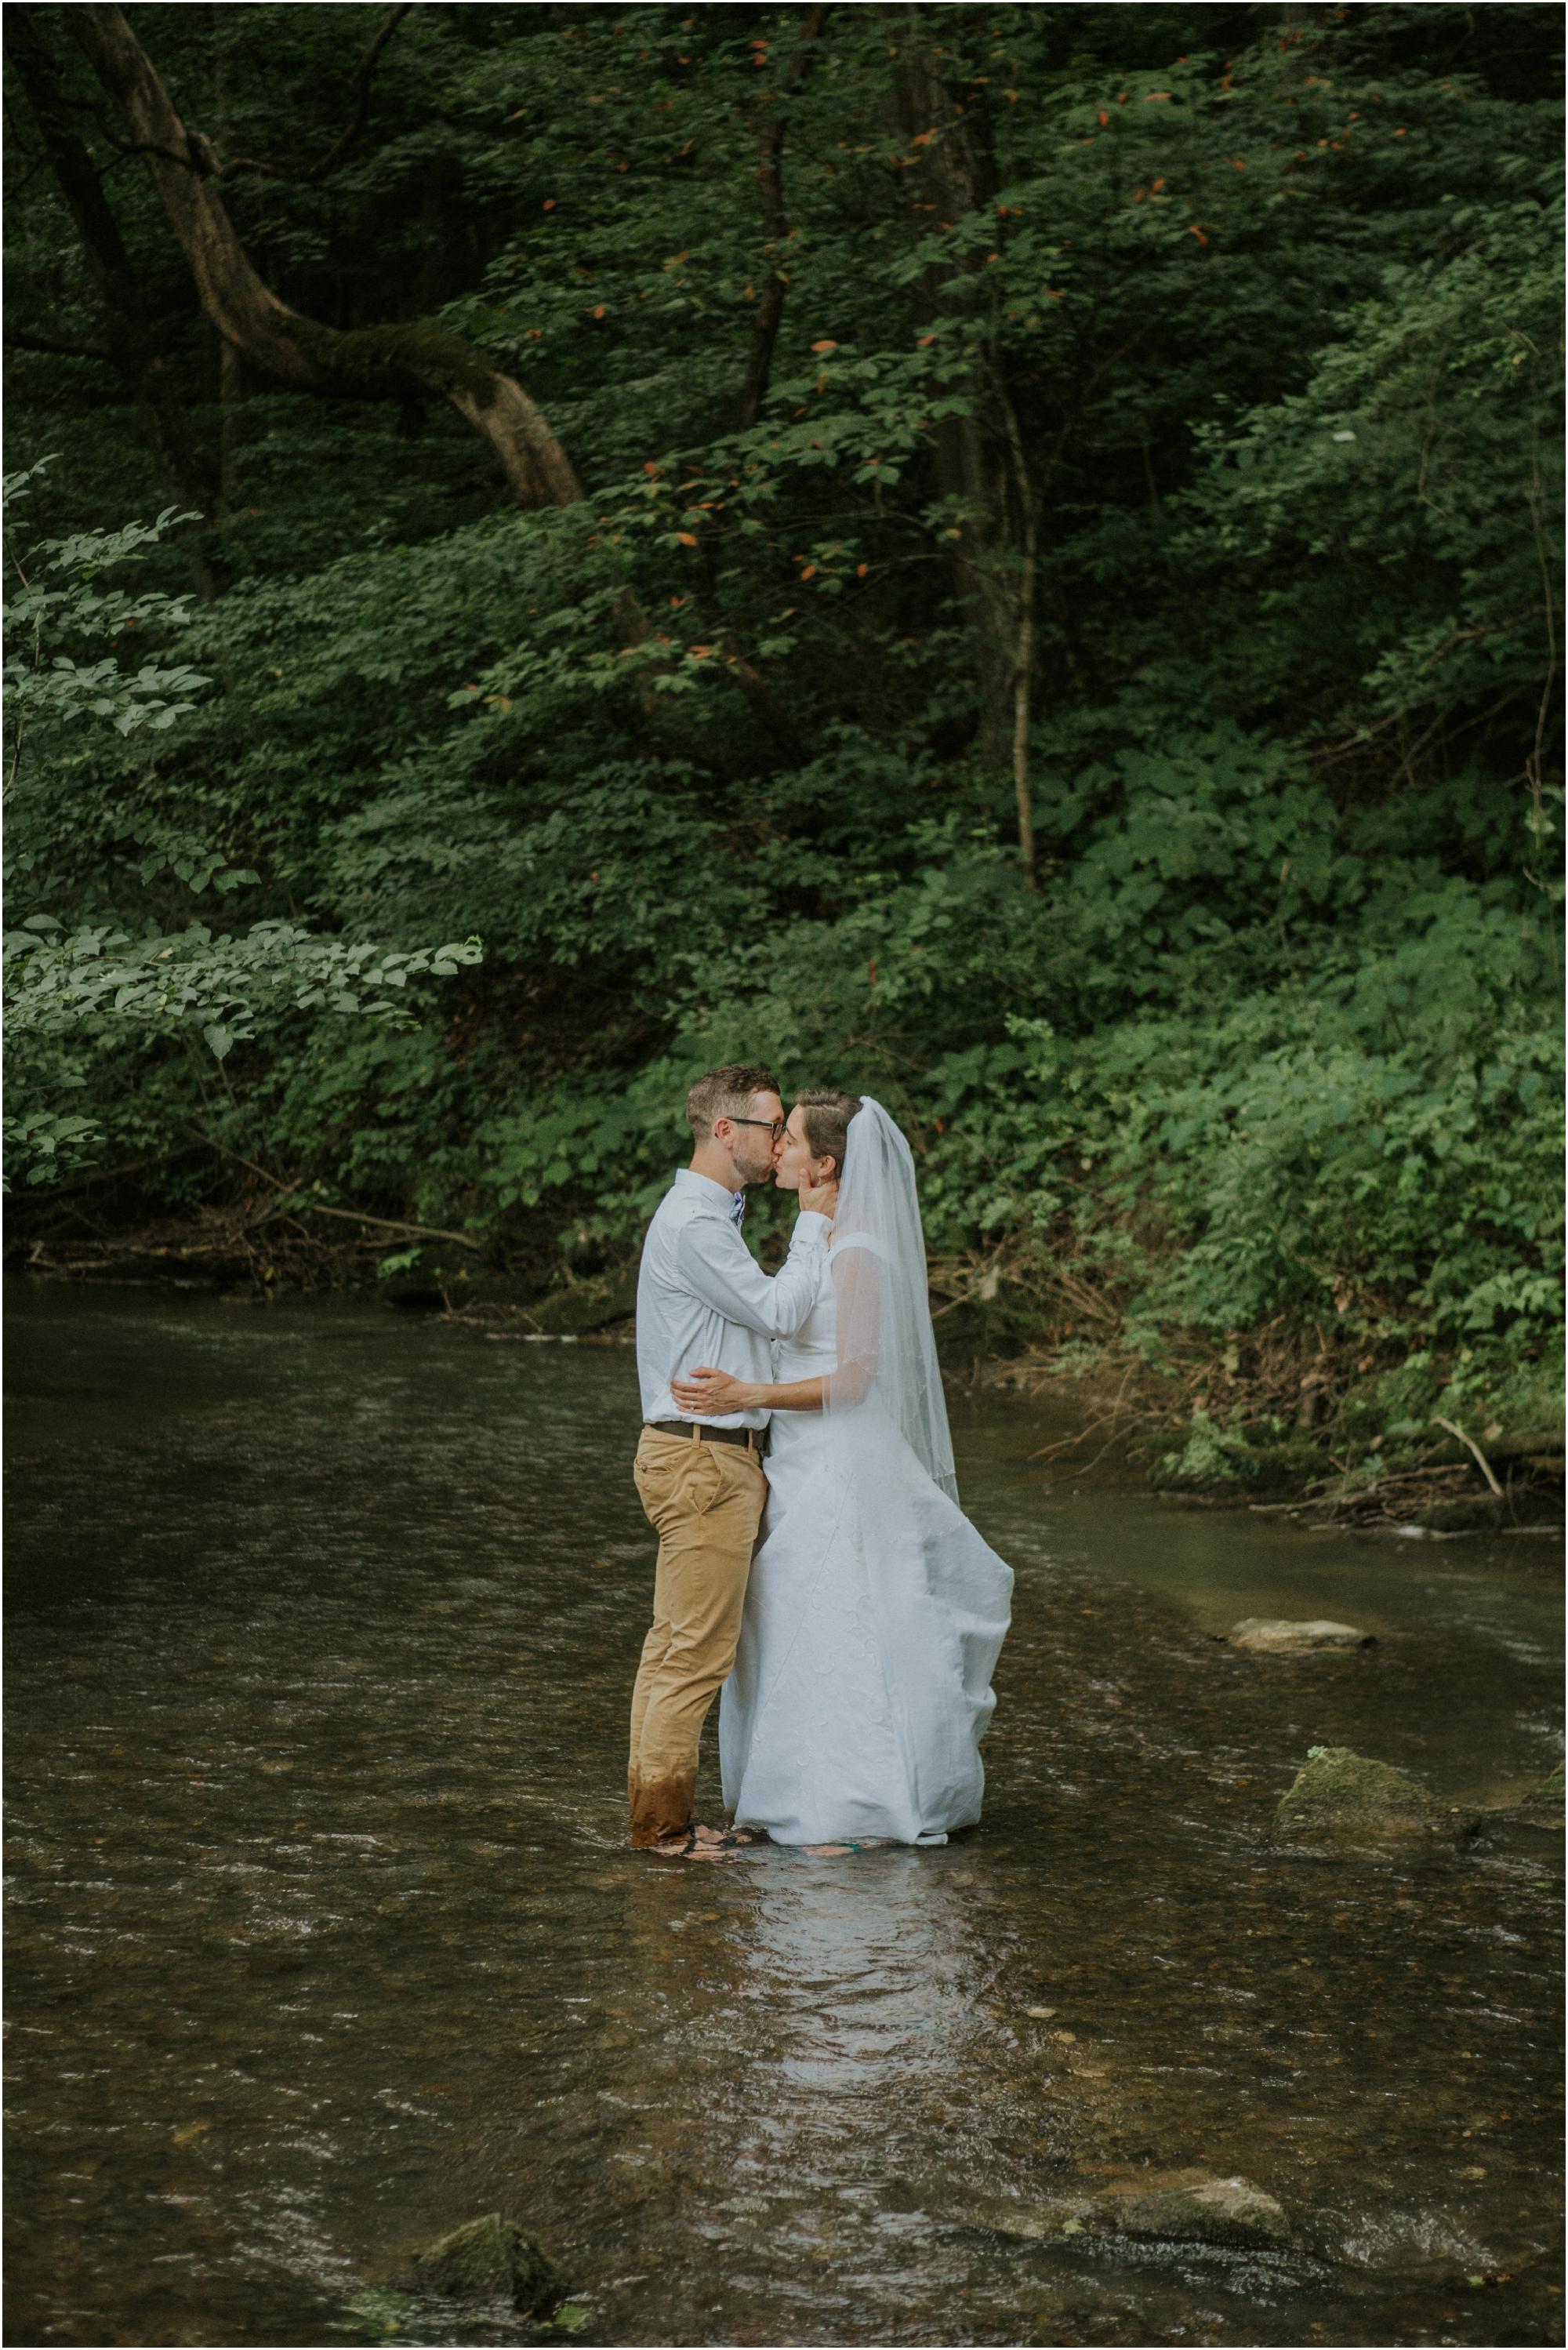 sugar-hollow-park-bristol-virginia-wedding-intimate-woodsy-black-forest-ceremony-adventurous-couple_0082.jpg